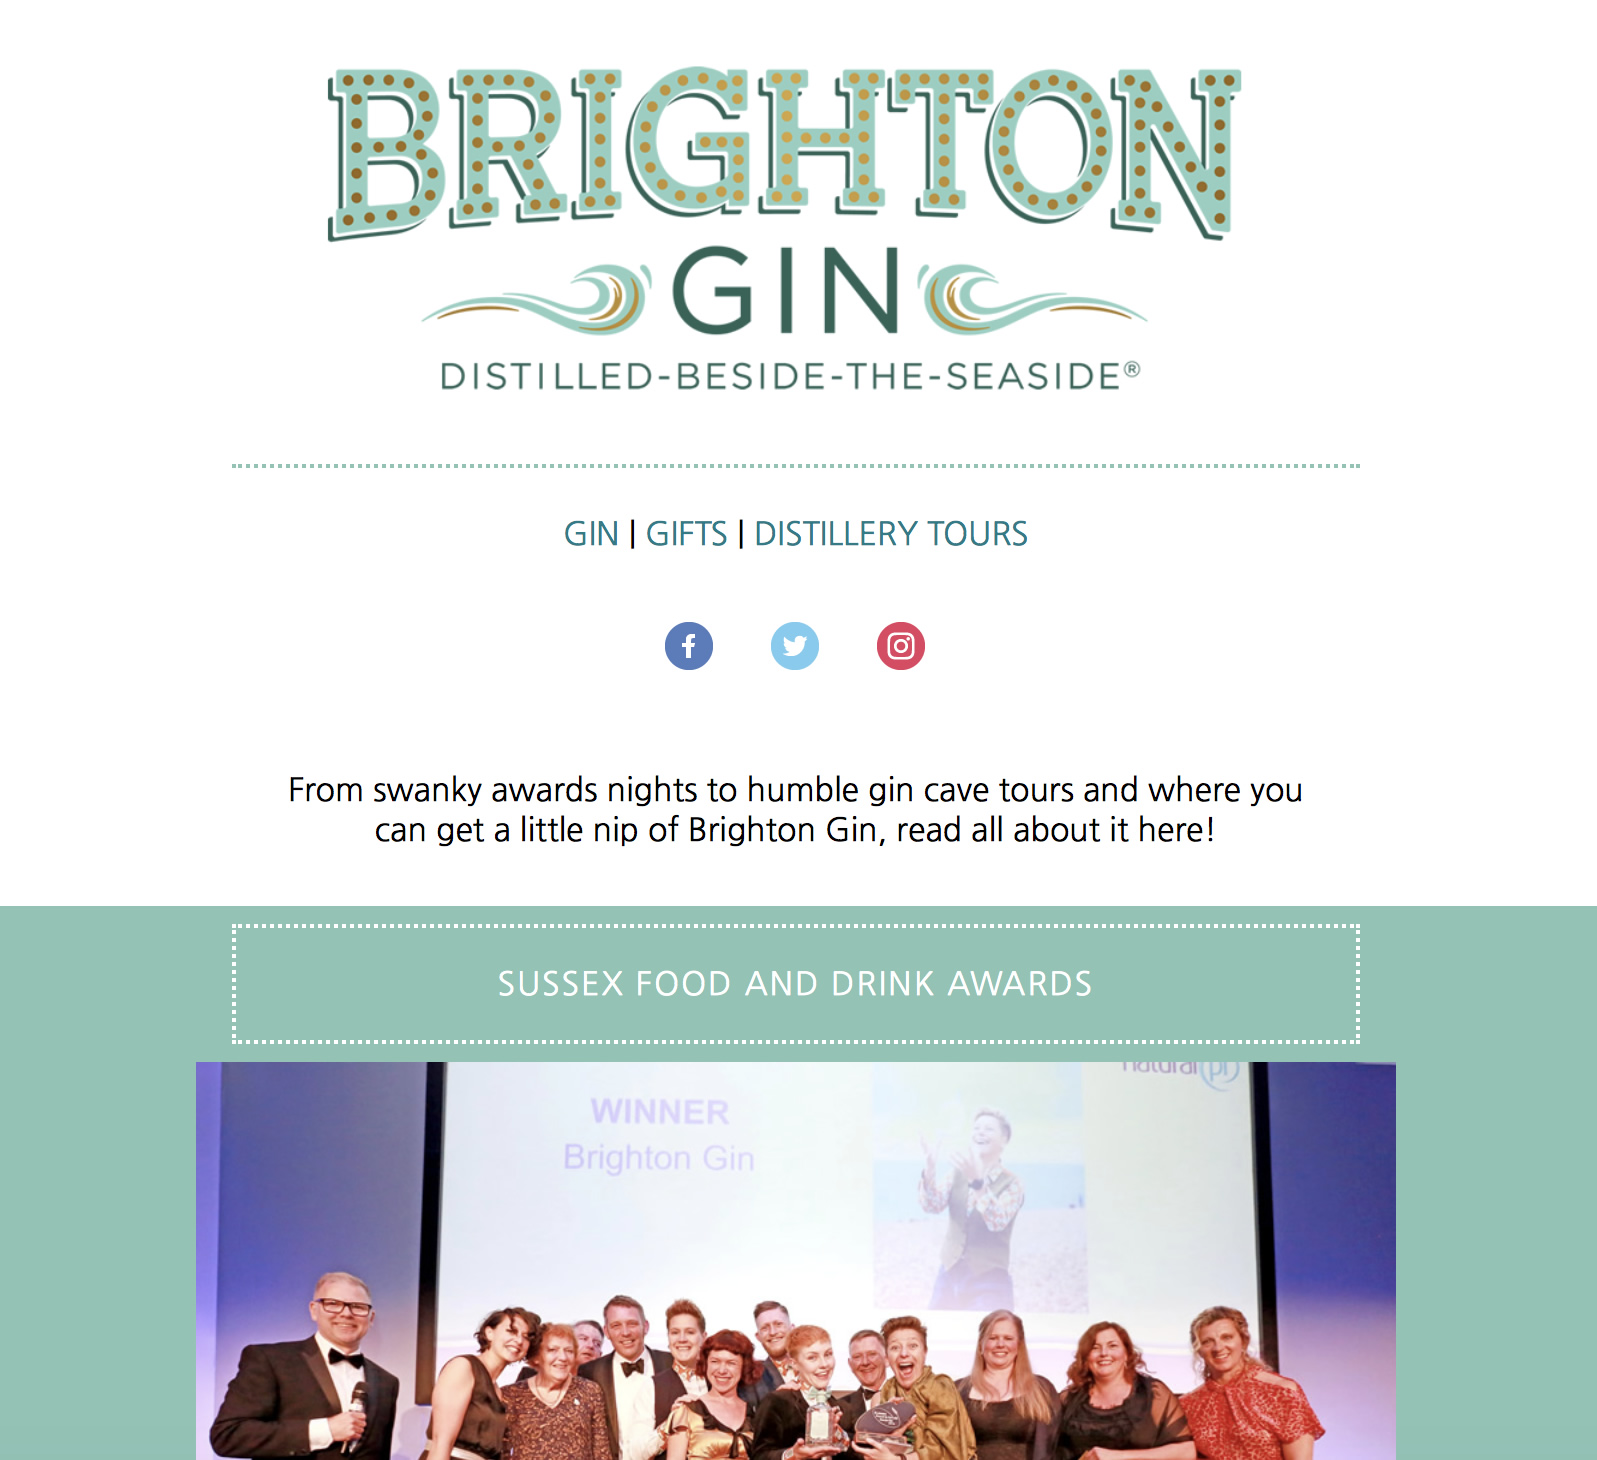 Brighton Gin newsletter design by Shake It Up Creative